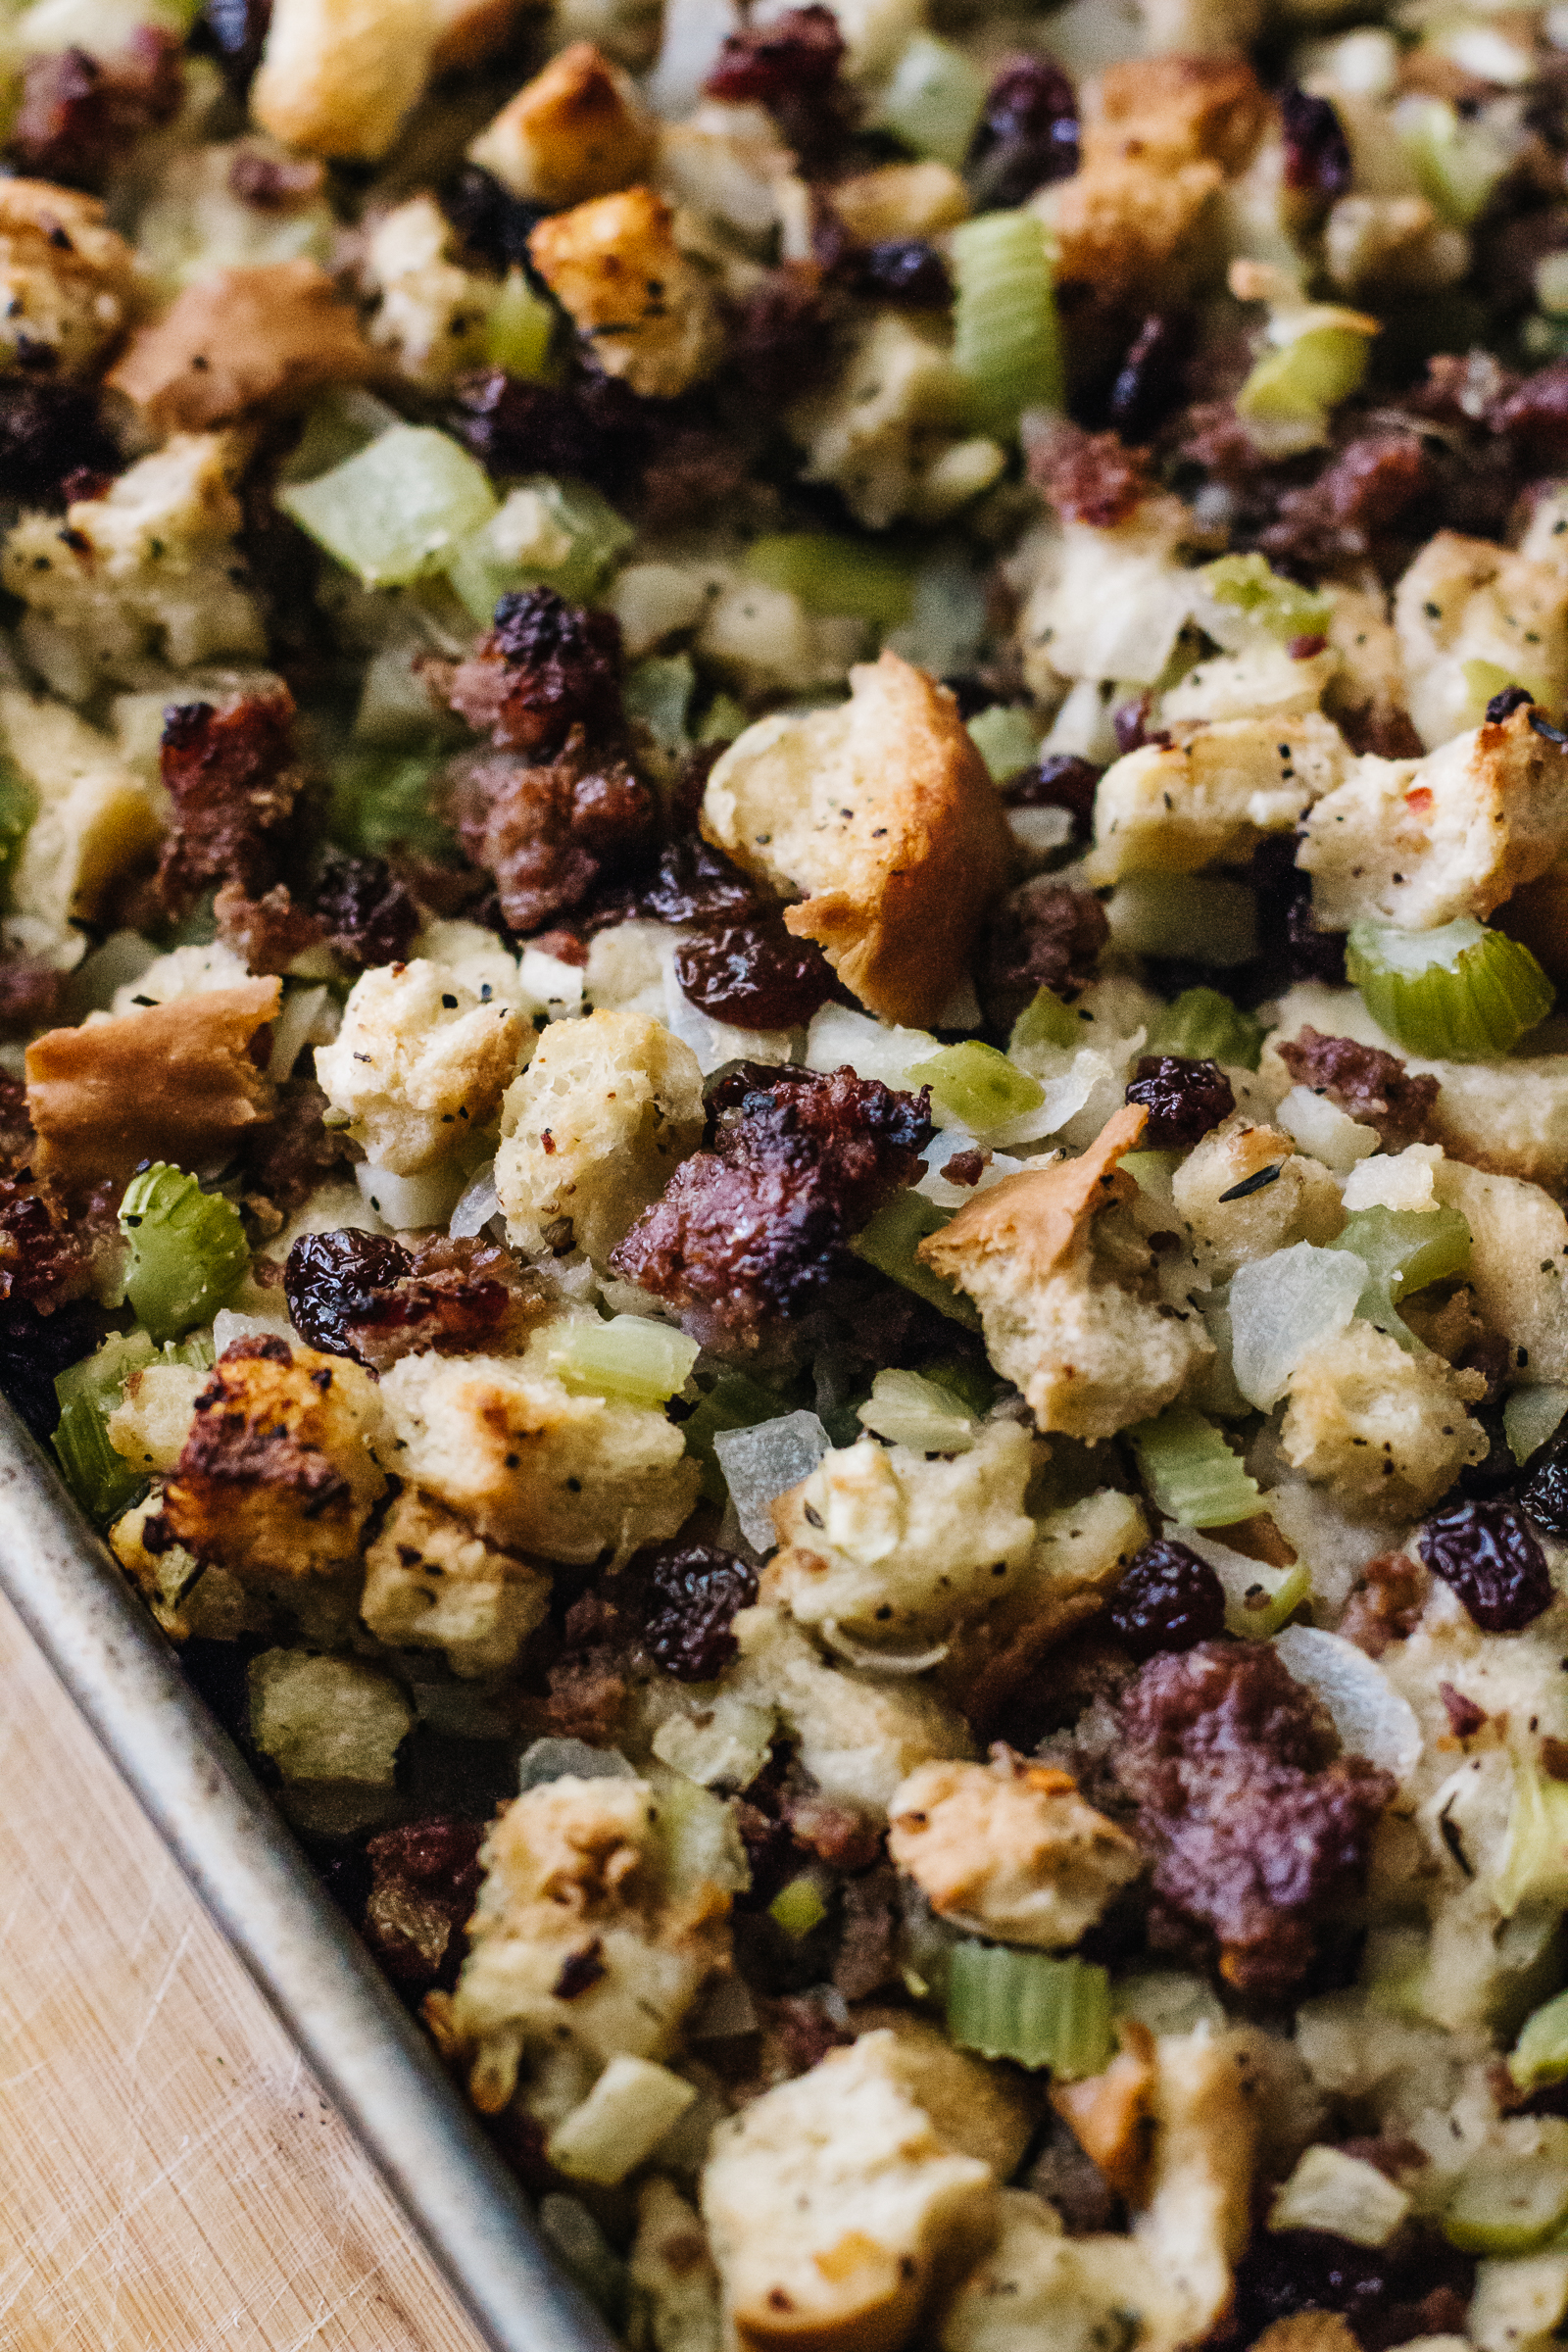 johnsonville sausage, #sausagefamily, thanksgiving stuffing recipe, sausage stuffing recipe, food blog